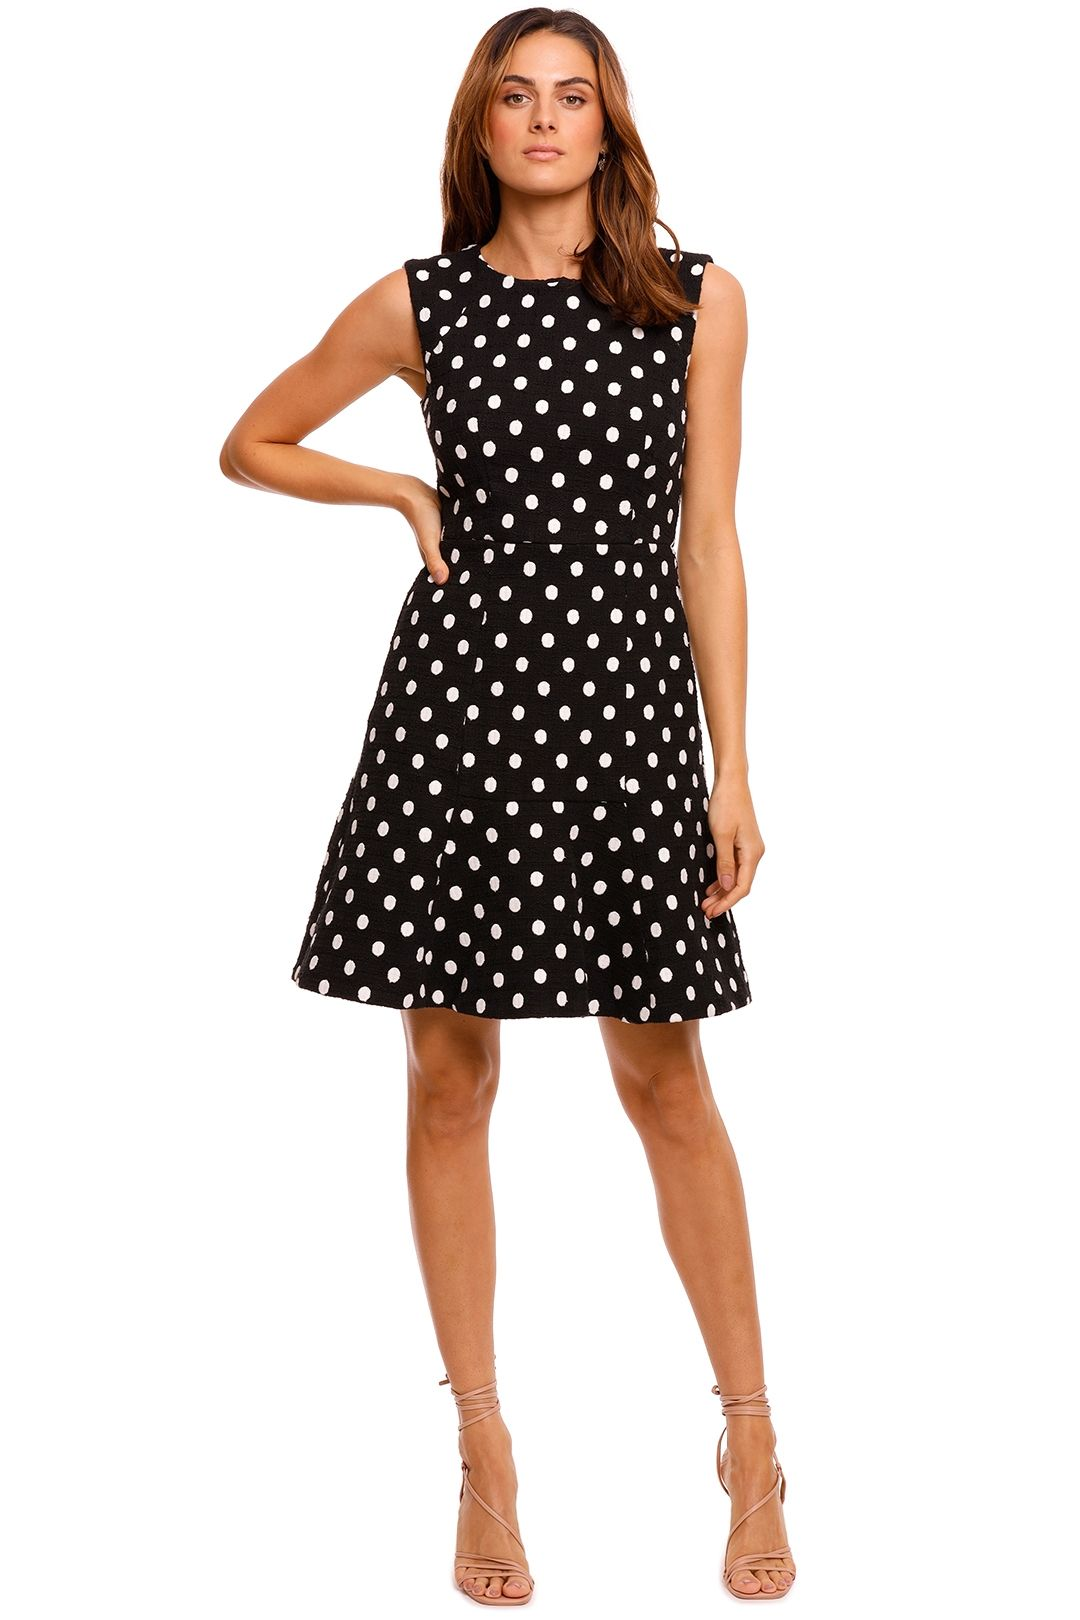 J.Crew Sor Polka Dot dress mini